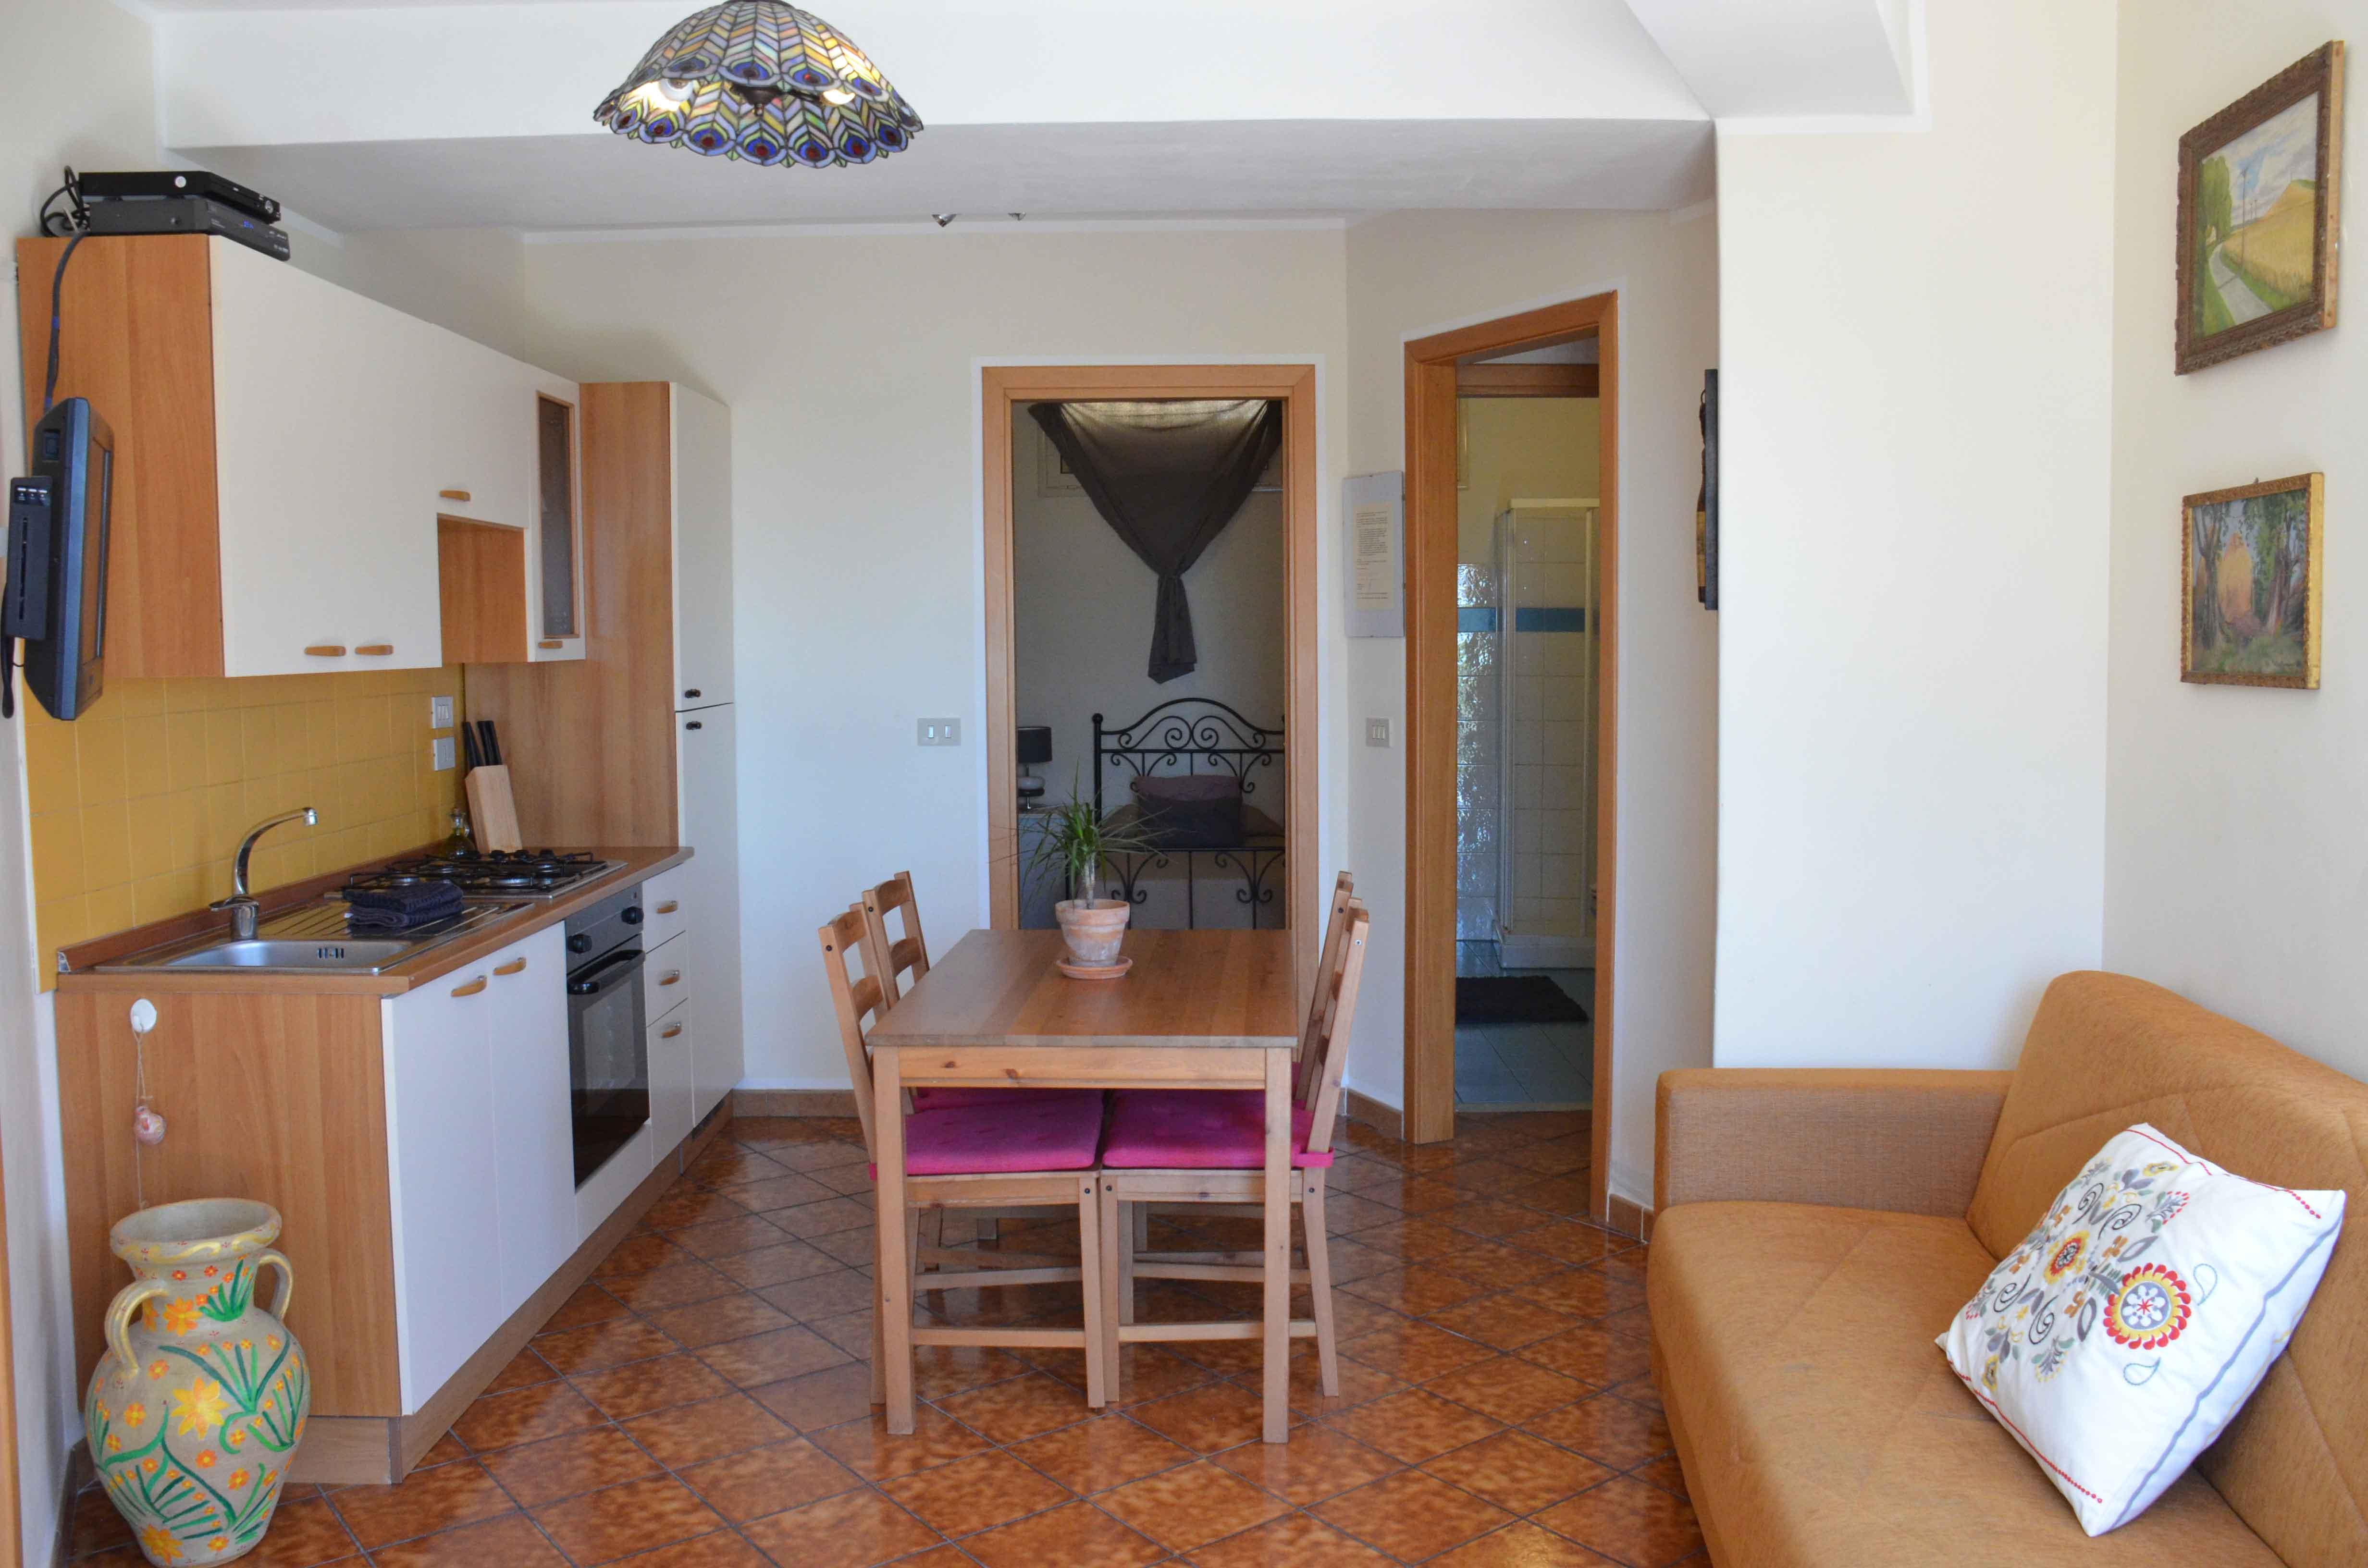 Salso Apartment Taormina Sicily - The Lemon Tree | Holiday ...